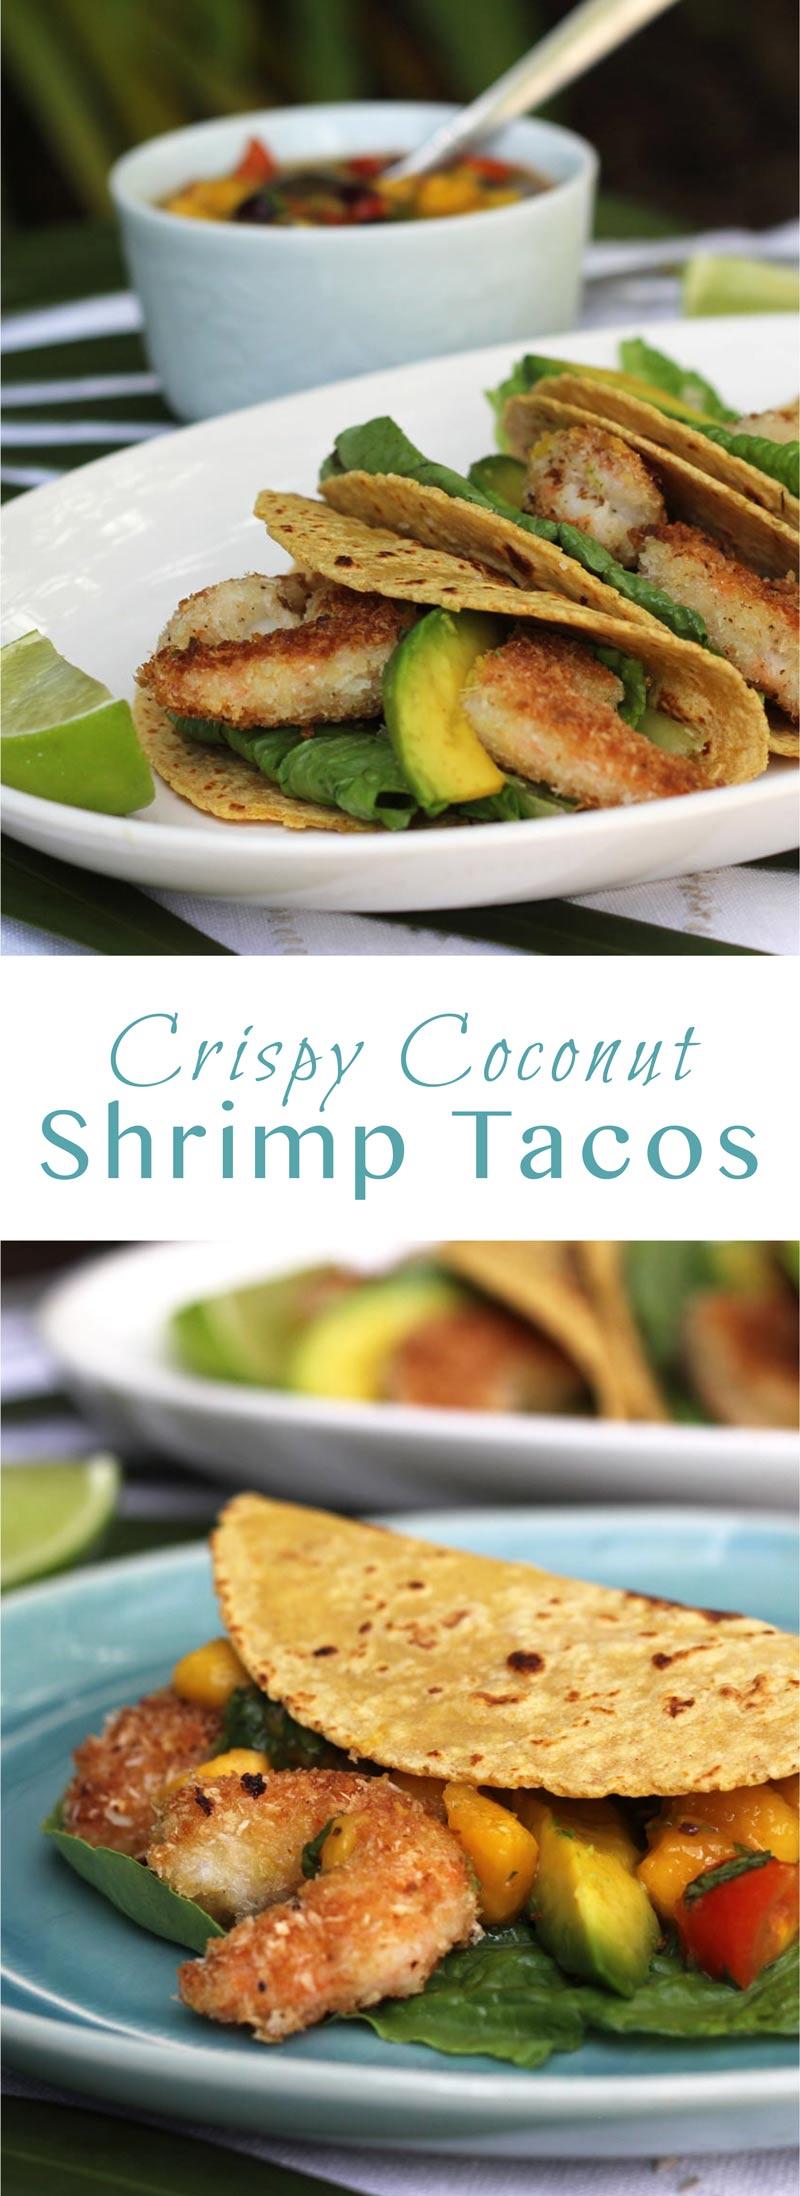 Crispy Coconut Shrimp Tacos with Mango Salsa from Suwannee Rose